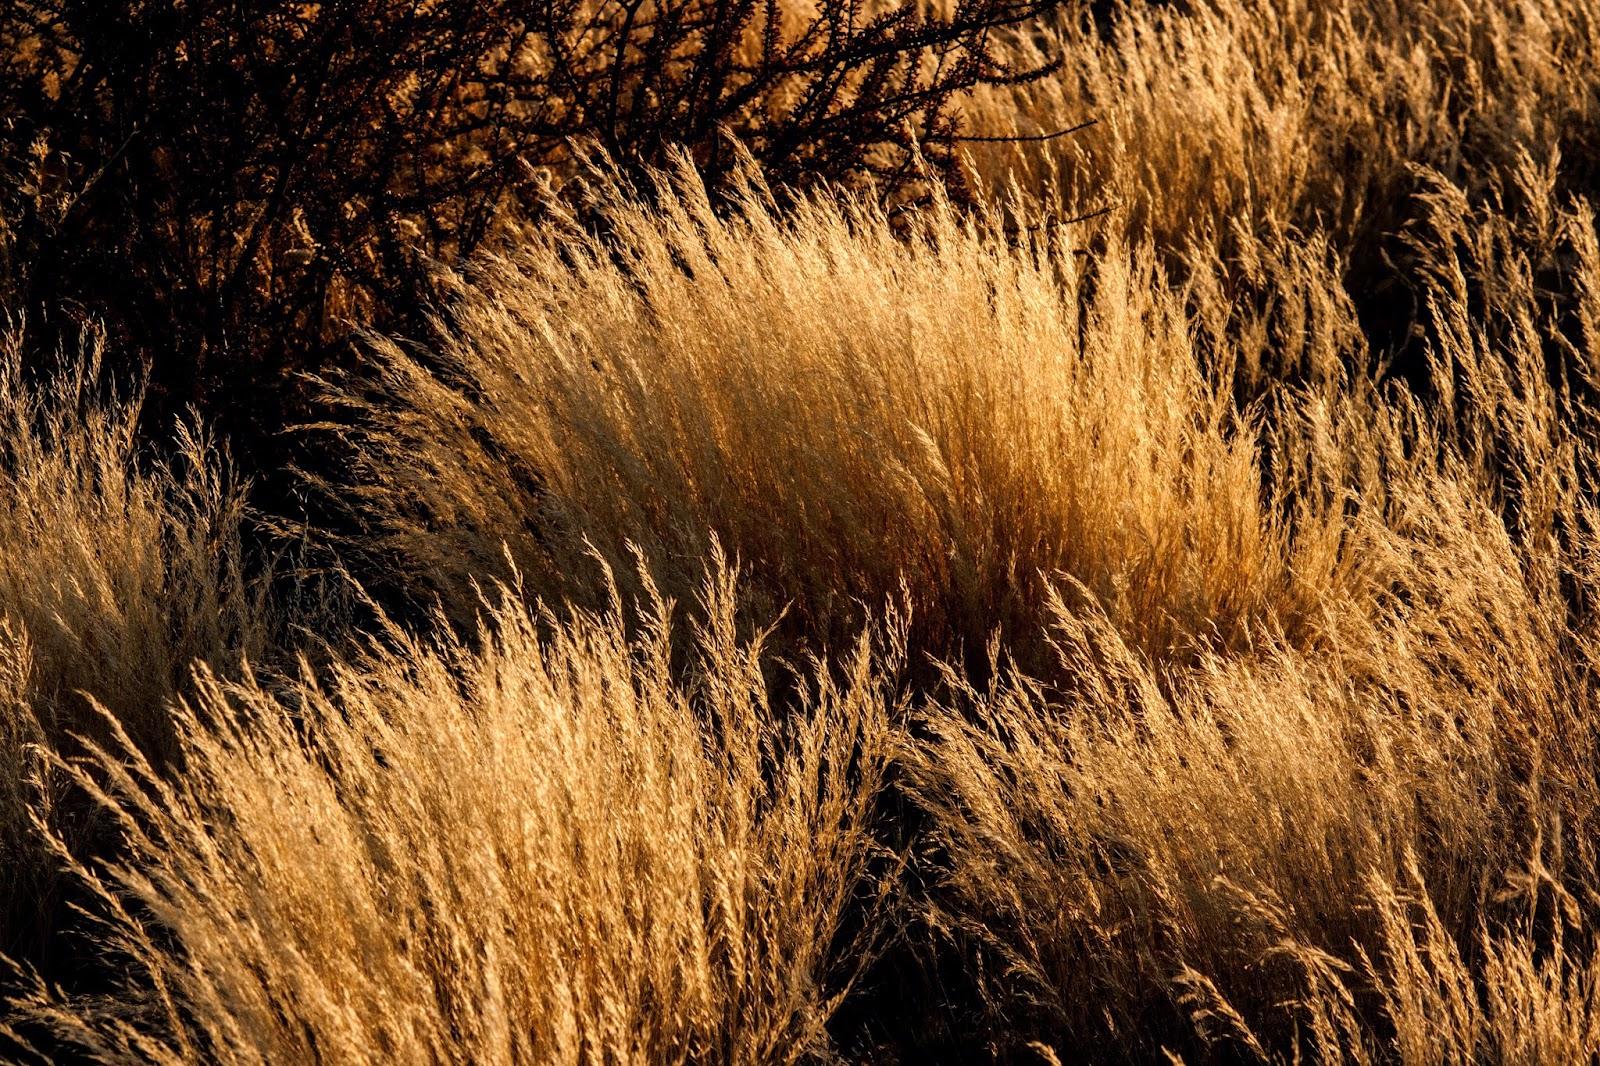 bush weed etosha namibia safari